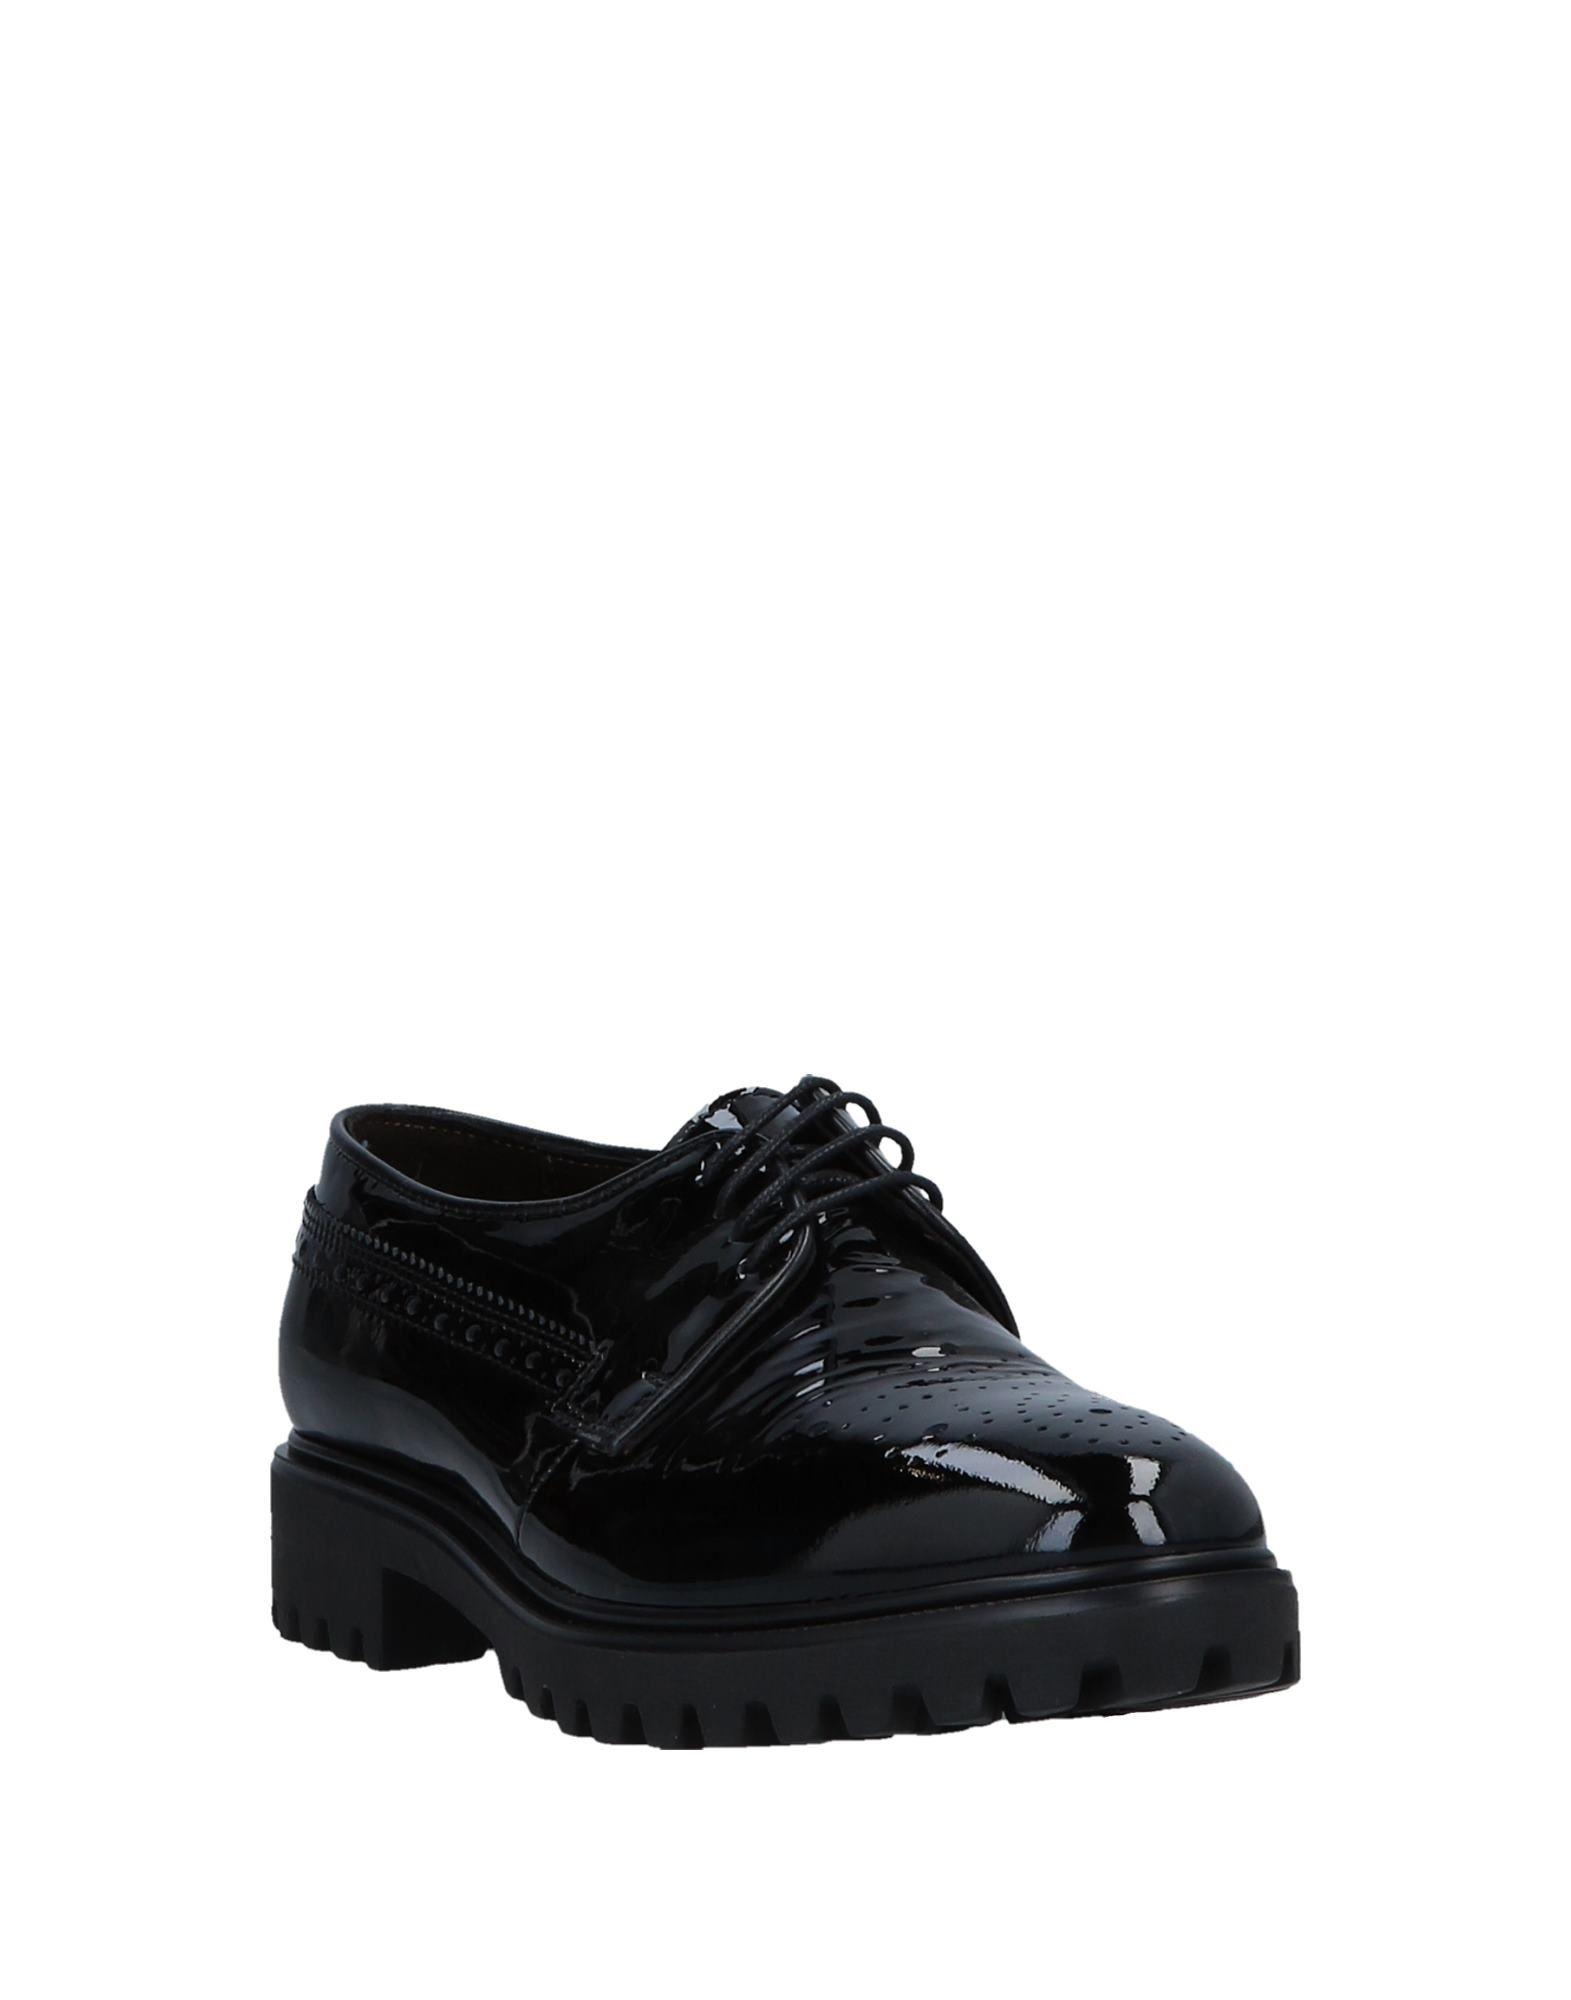 Stilvolle billige Schuhe Damen Marco Ferretti Schnürschuhe Damen Schuhe  11499098OA 04314f